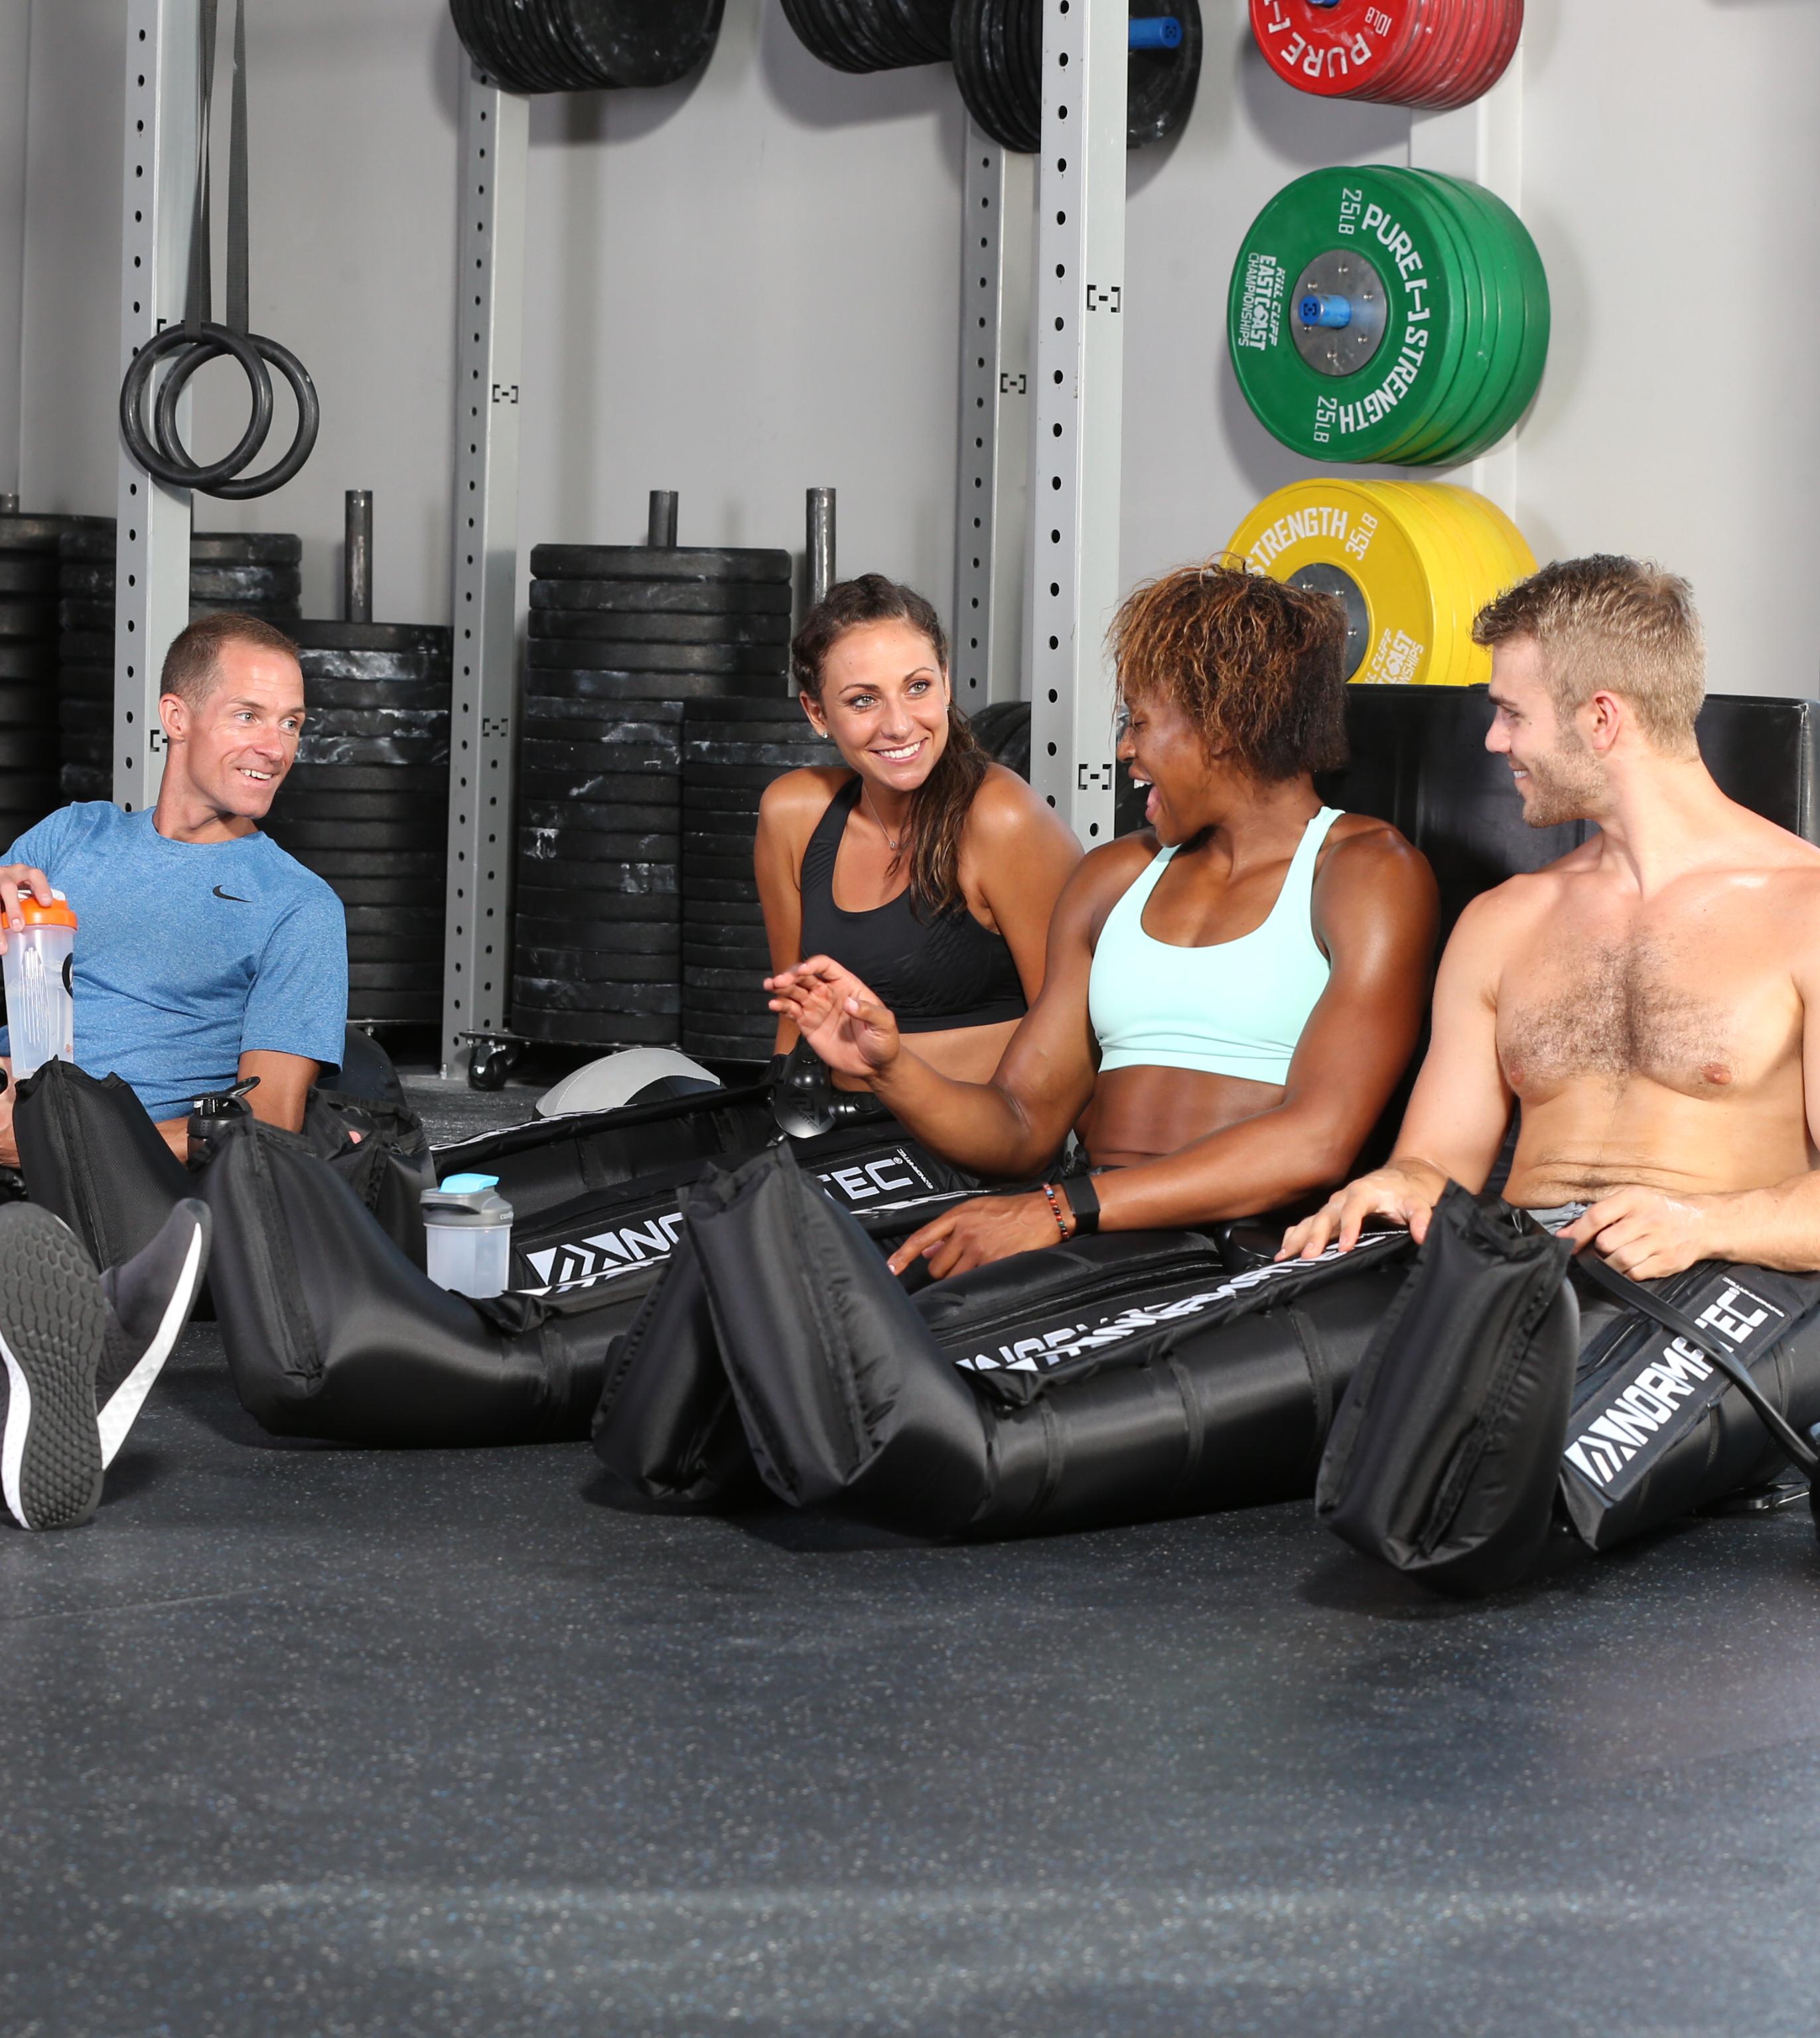 NormaTec, Norma Tec, Recovery, athlete, marathon, triathalon, iron man